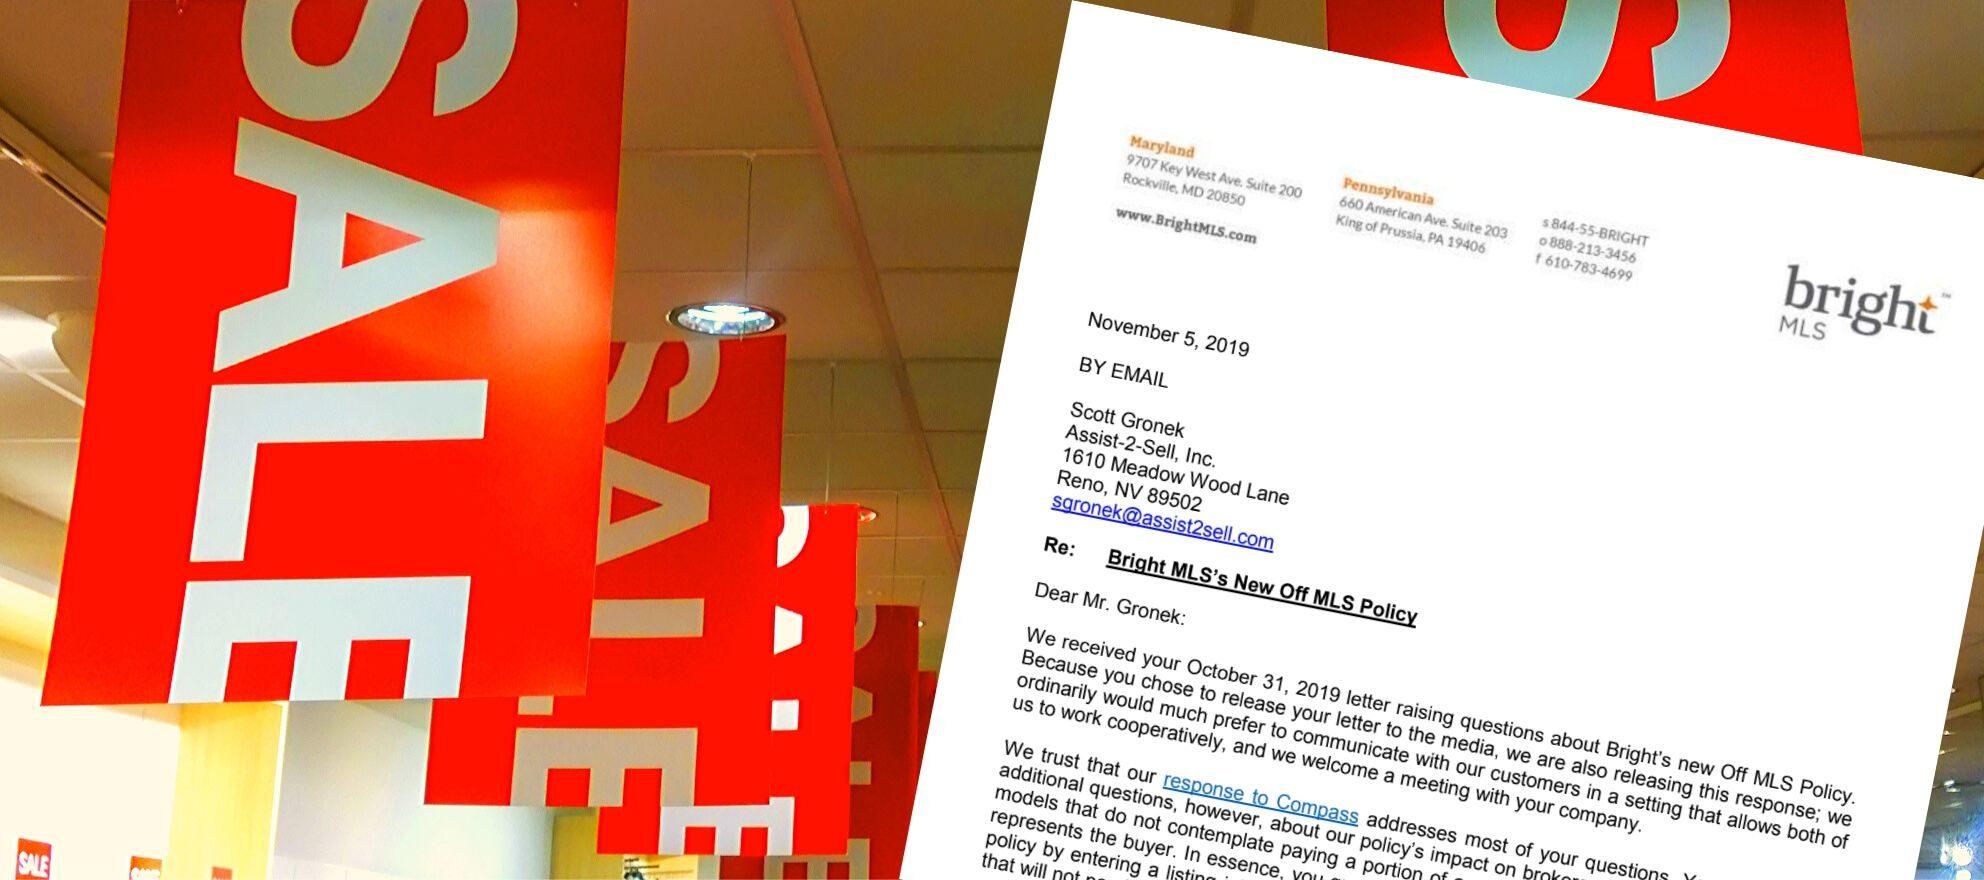 Bright MLS: Pocket listing ban won't hurt discount brokerages